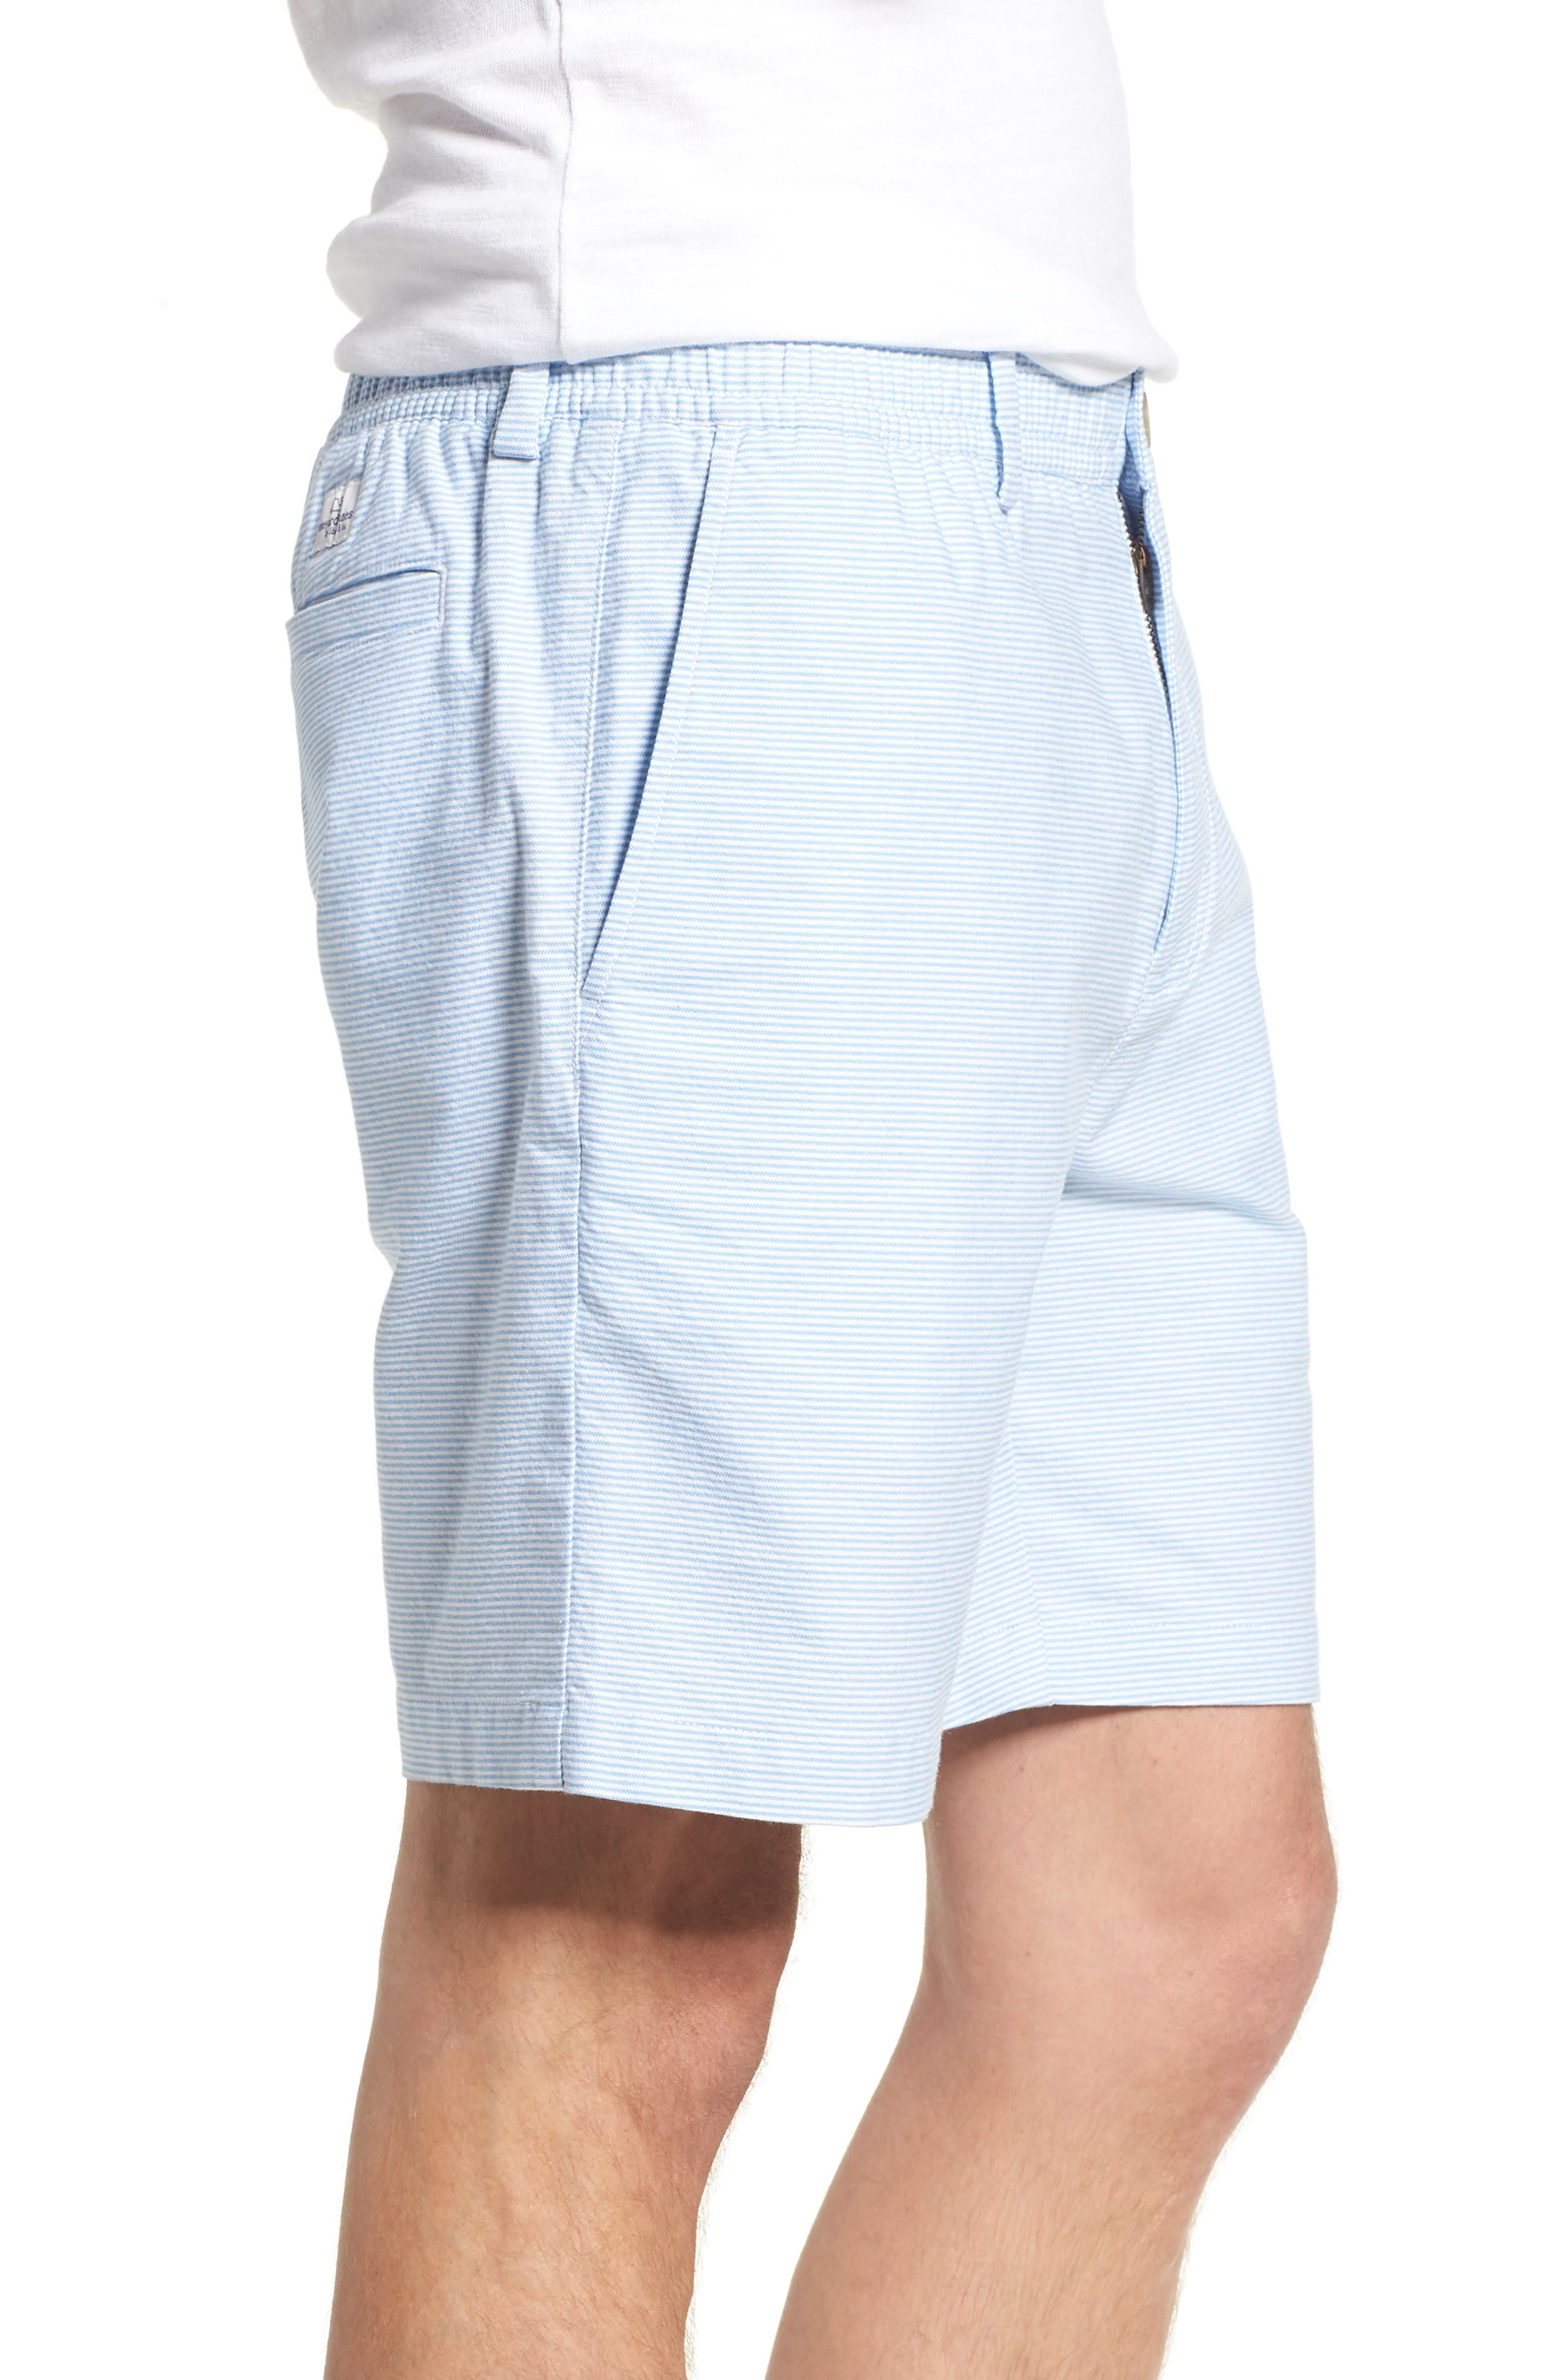 Jetty Stripe Stretch Cotton Shorts,                             Alternate thumbnail 3, color,                             Ocean Breeze